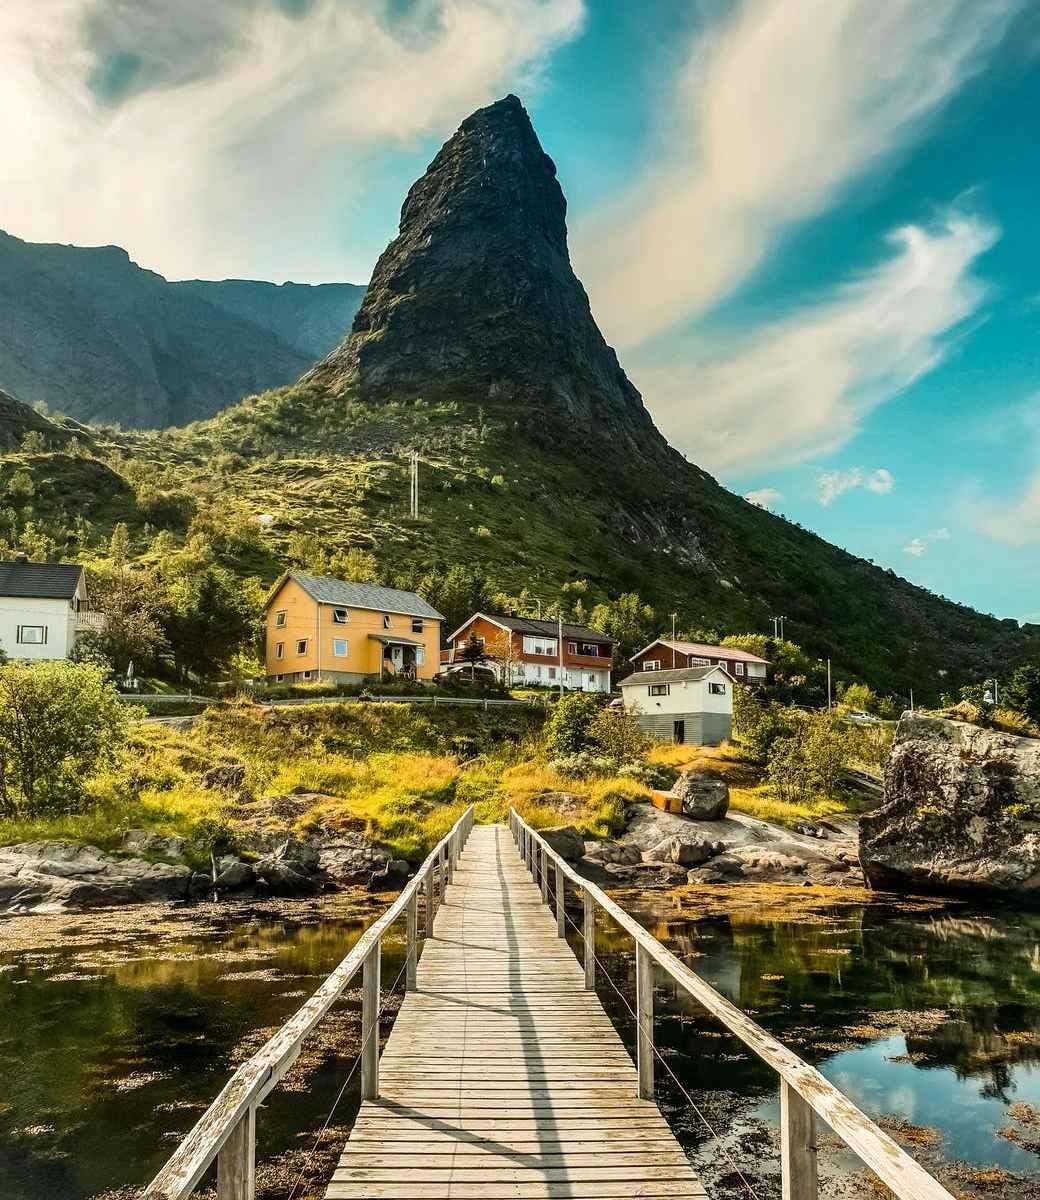 landscape photography of landmark mountain